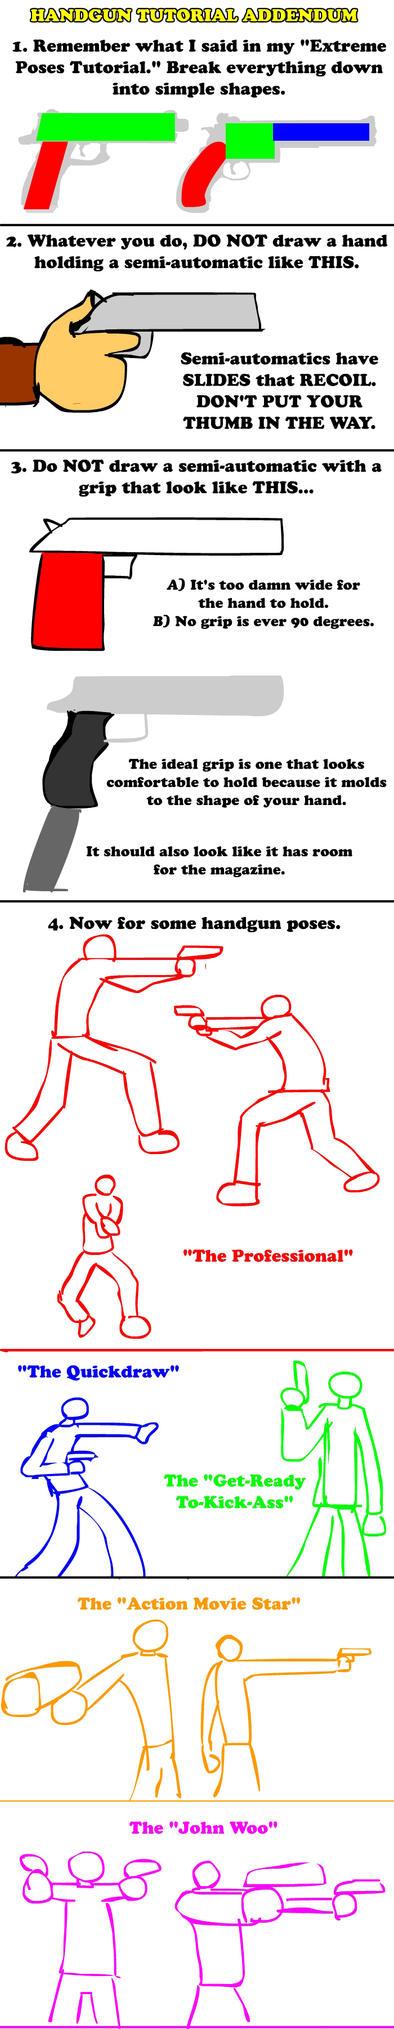 HANDGUNS TUTORIAL ADDENDUM by PhiTuS